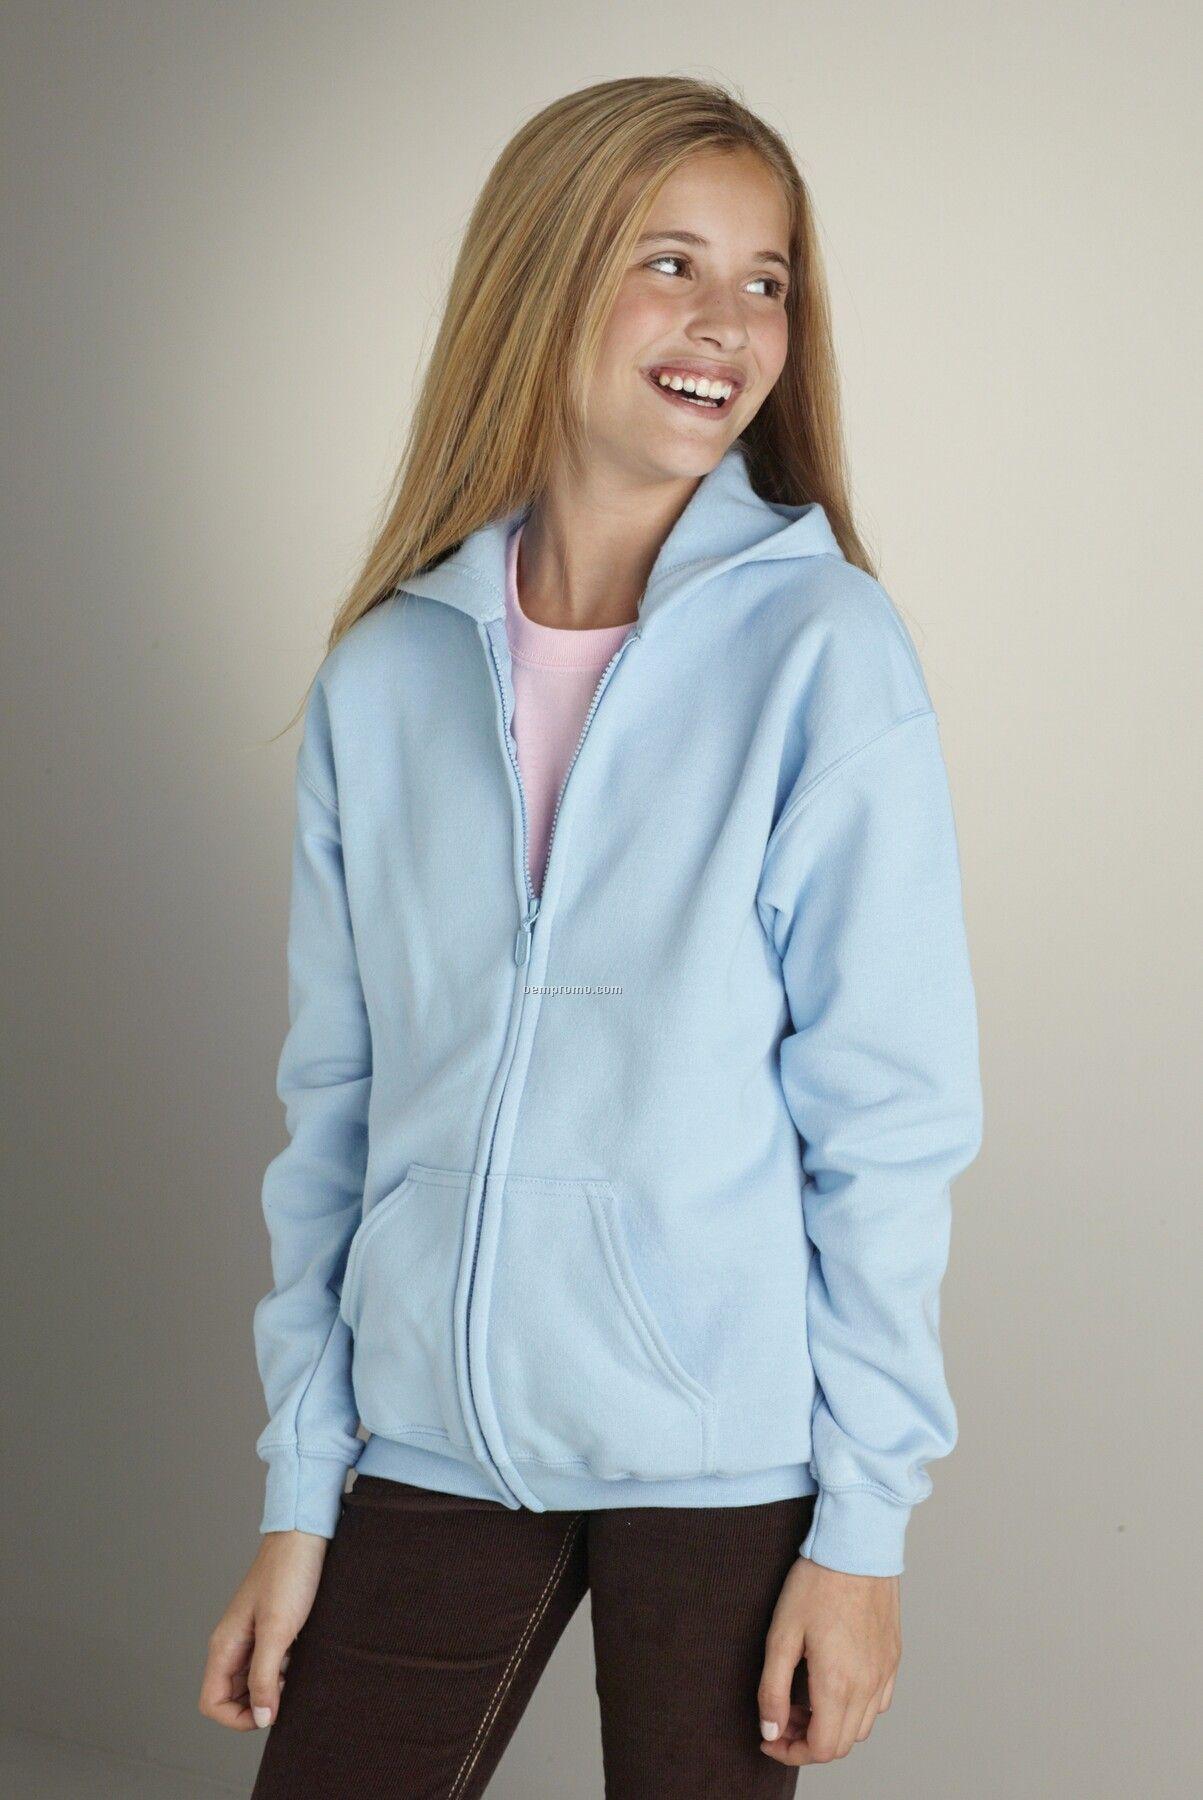 Youth Gildan Heavy Blend Full Zip Hooded Sweatshirt - Heather